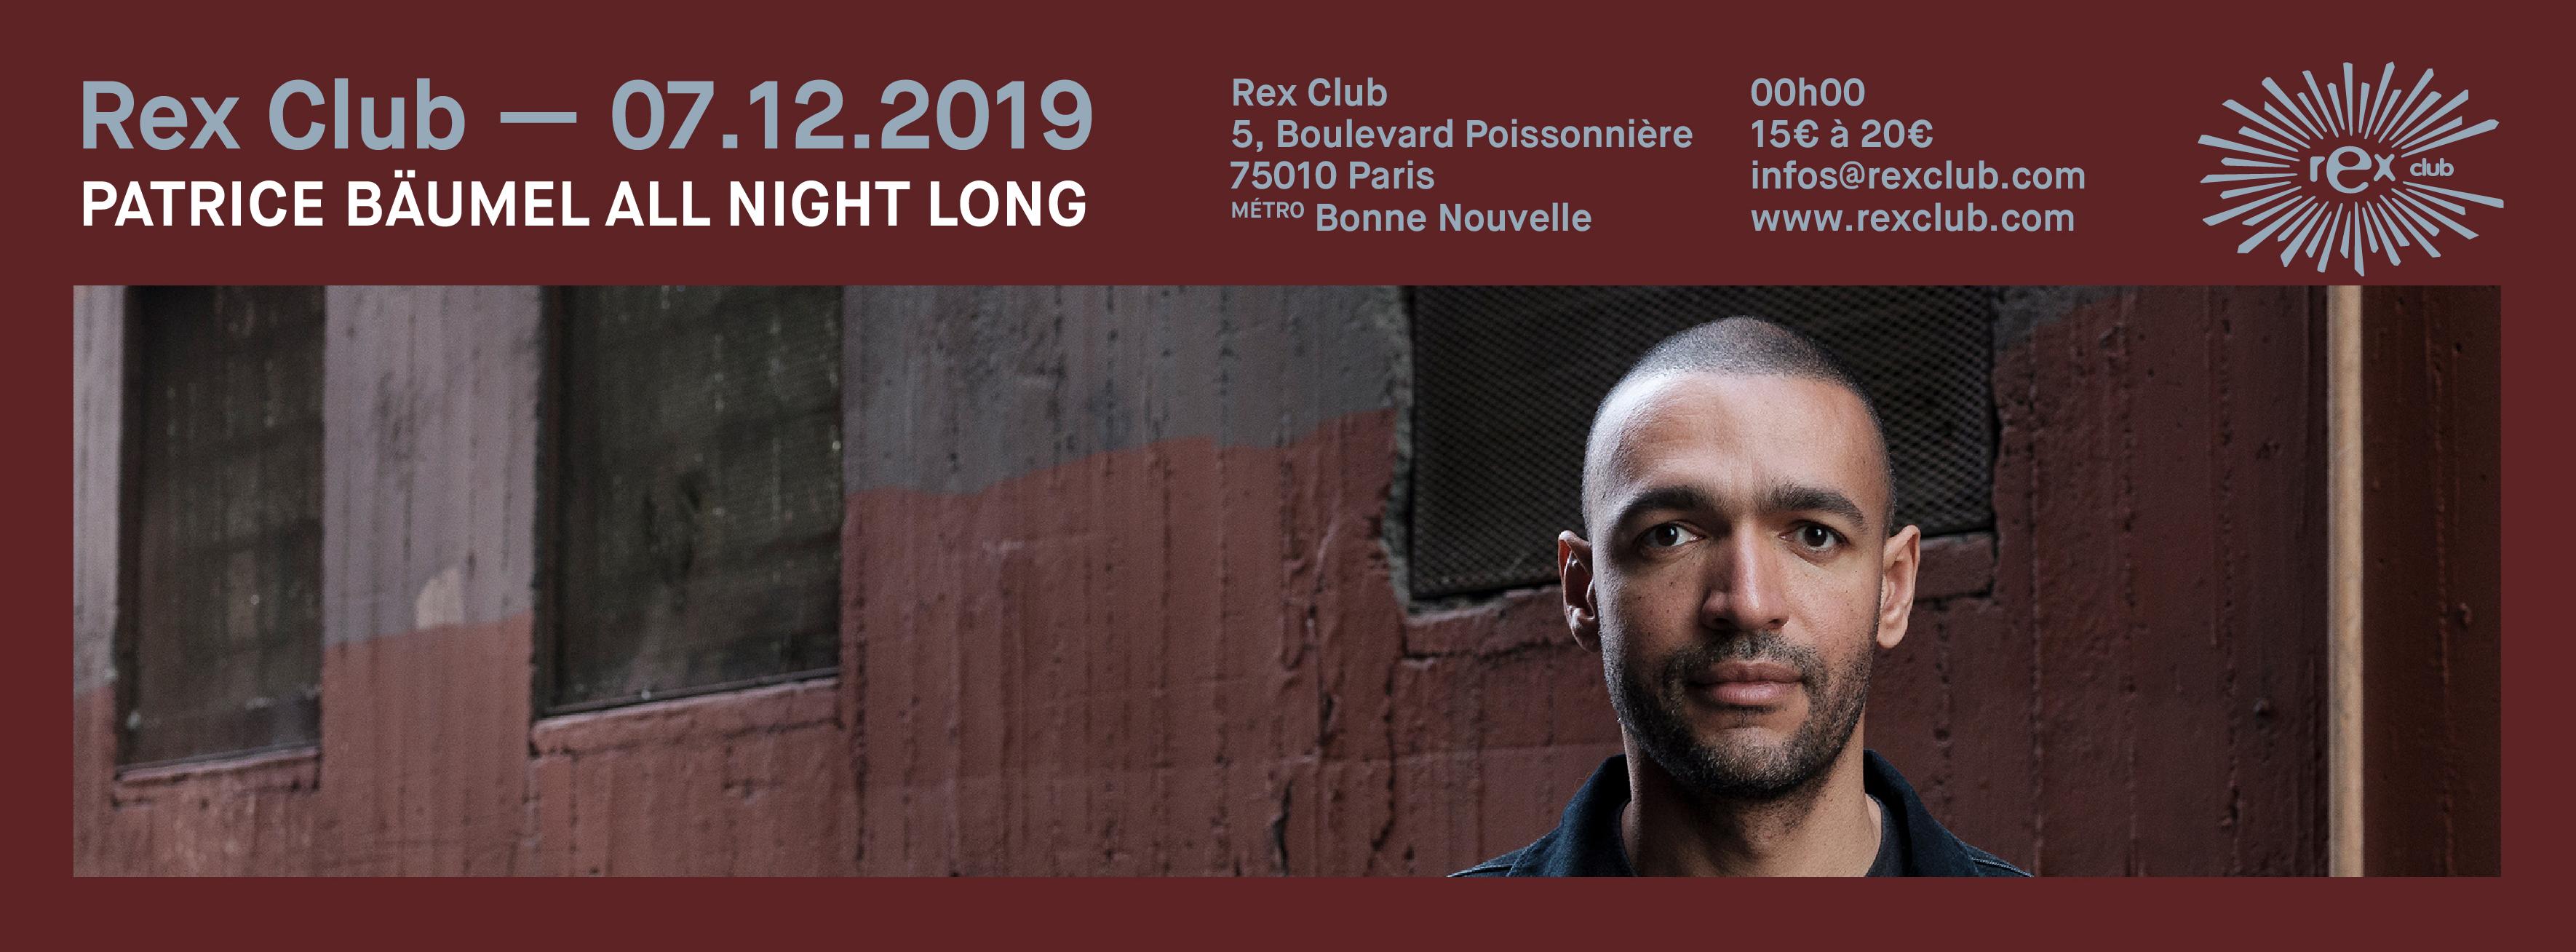 Rex Club presente Patrice Baumel All Night Long